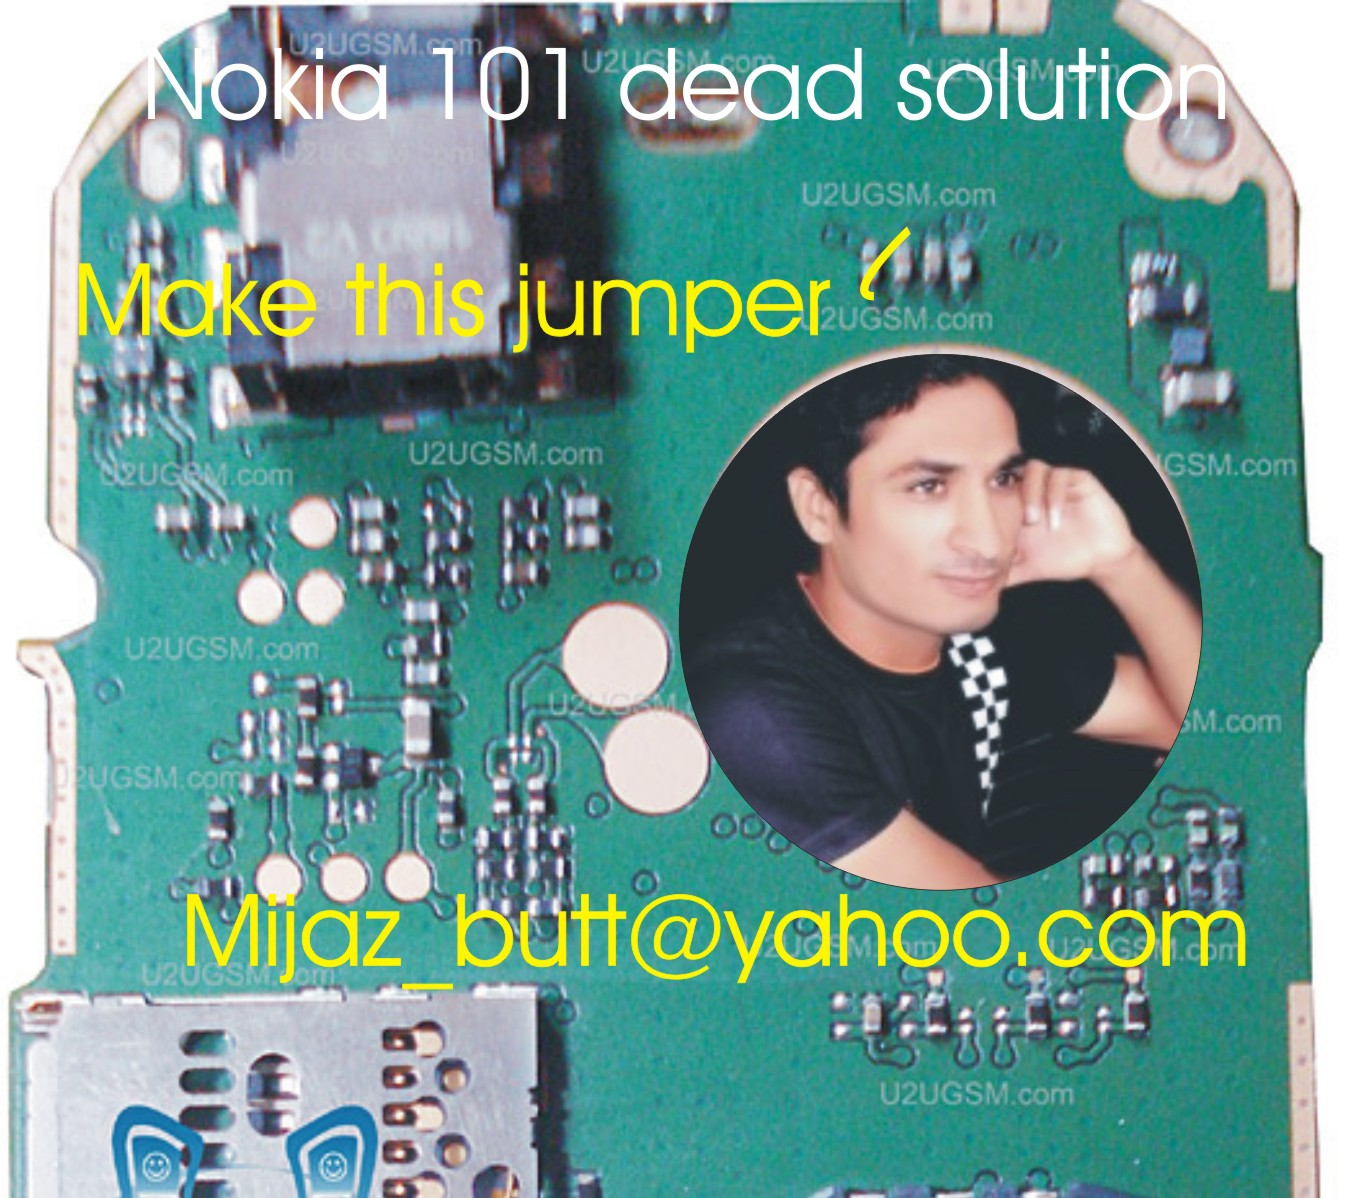 Nokia 101 Dead Solution